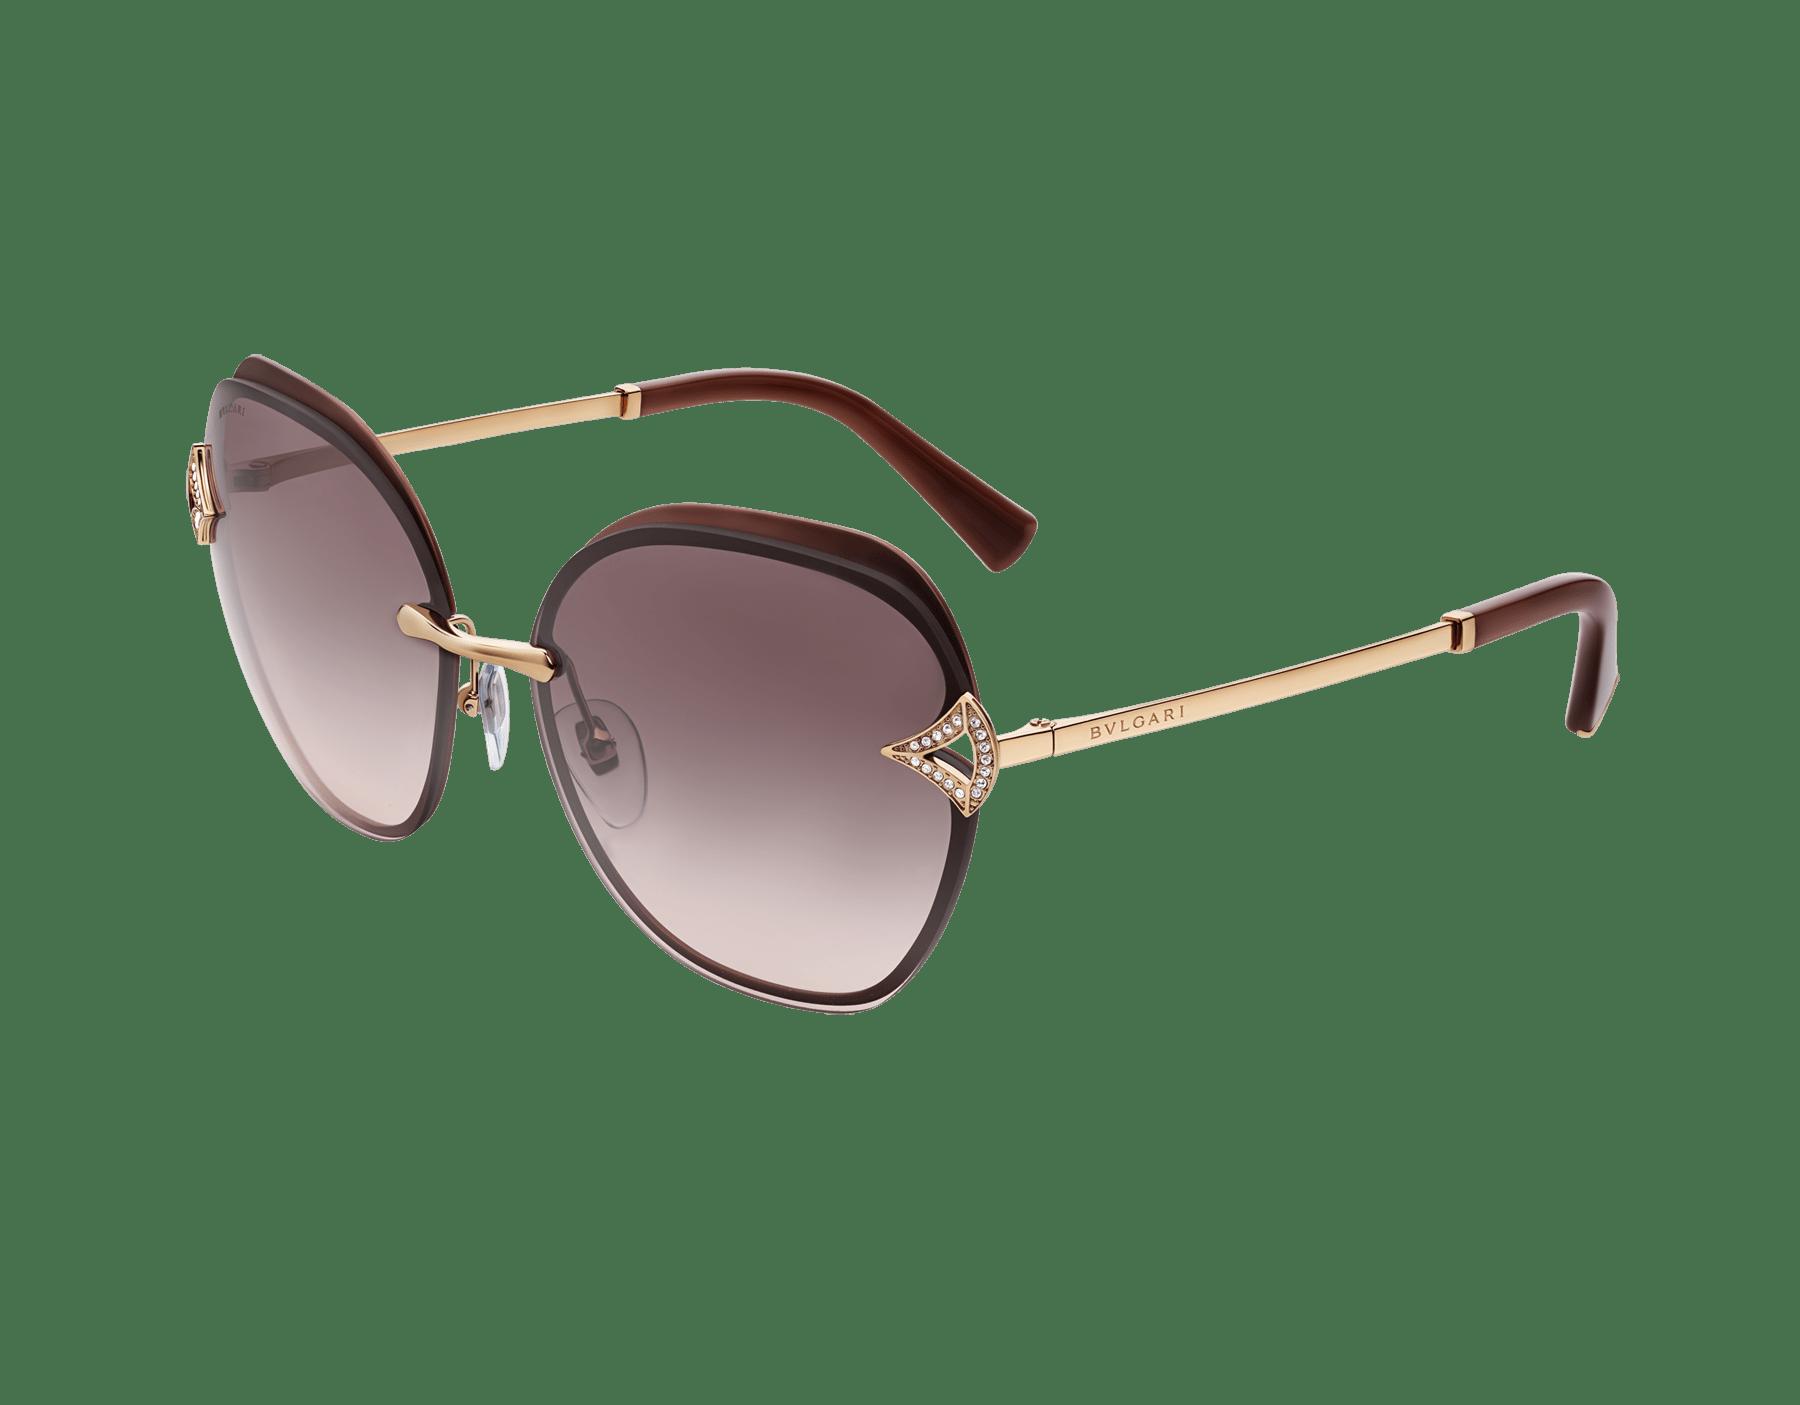 Bvlgari DIVAS' DREAM angular squared metal sunglasses 903670 image 1